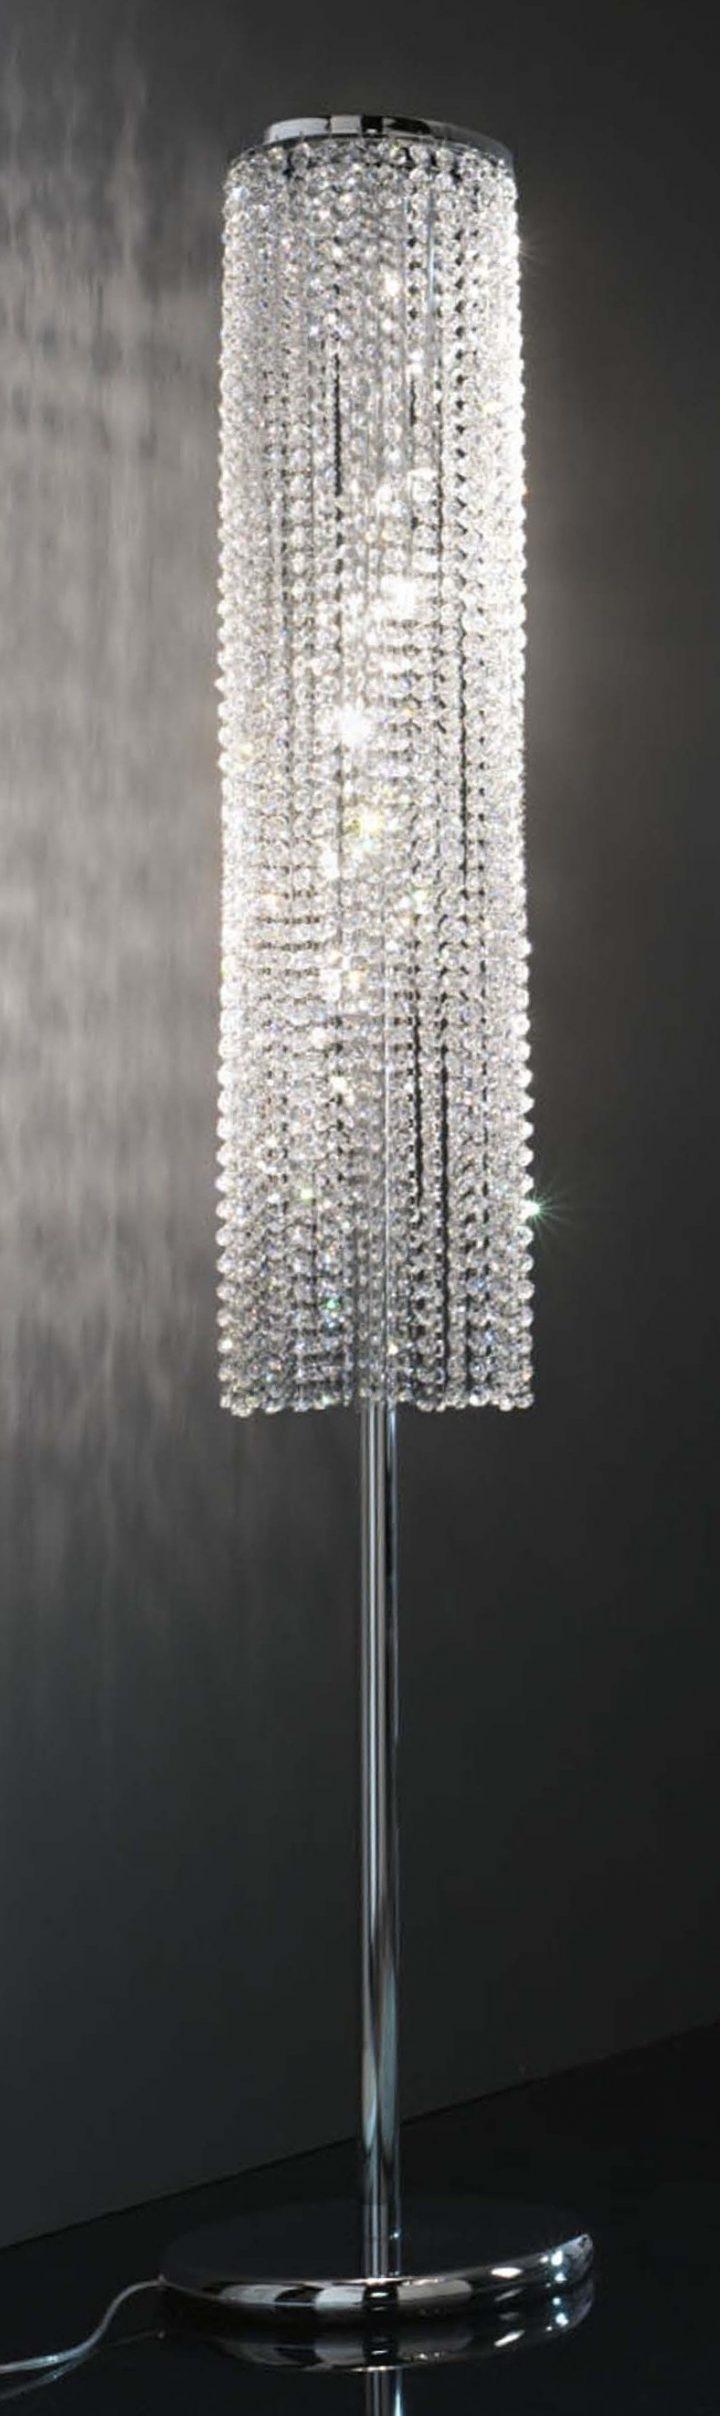 Trendy Crystal Chandelier Standing Lamps With Regard To Chandeliers Design : Magnificent Floor Lamp Crystal Chandelier Turn (View 12 of 15)